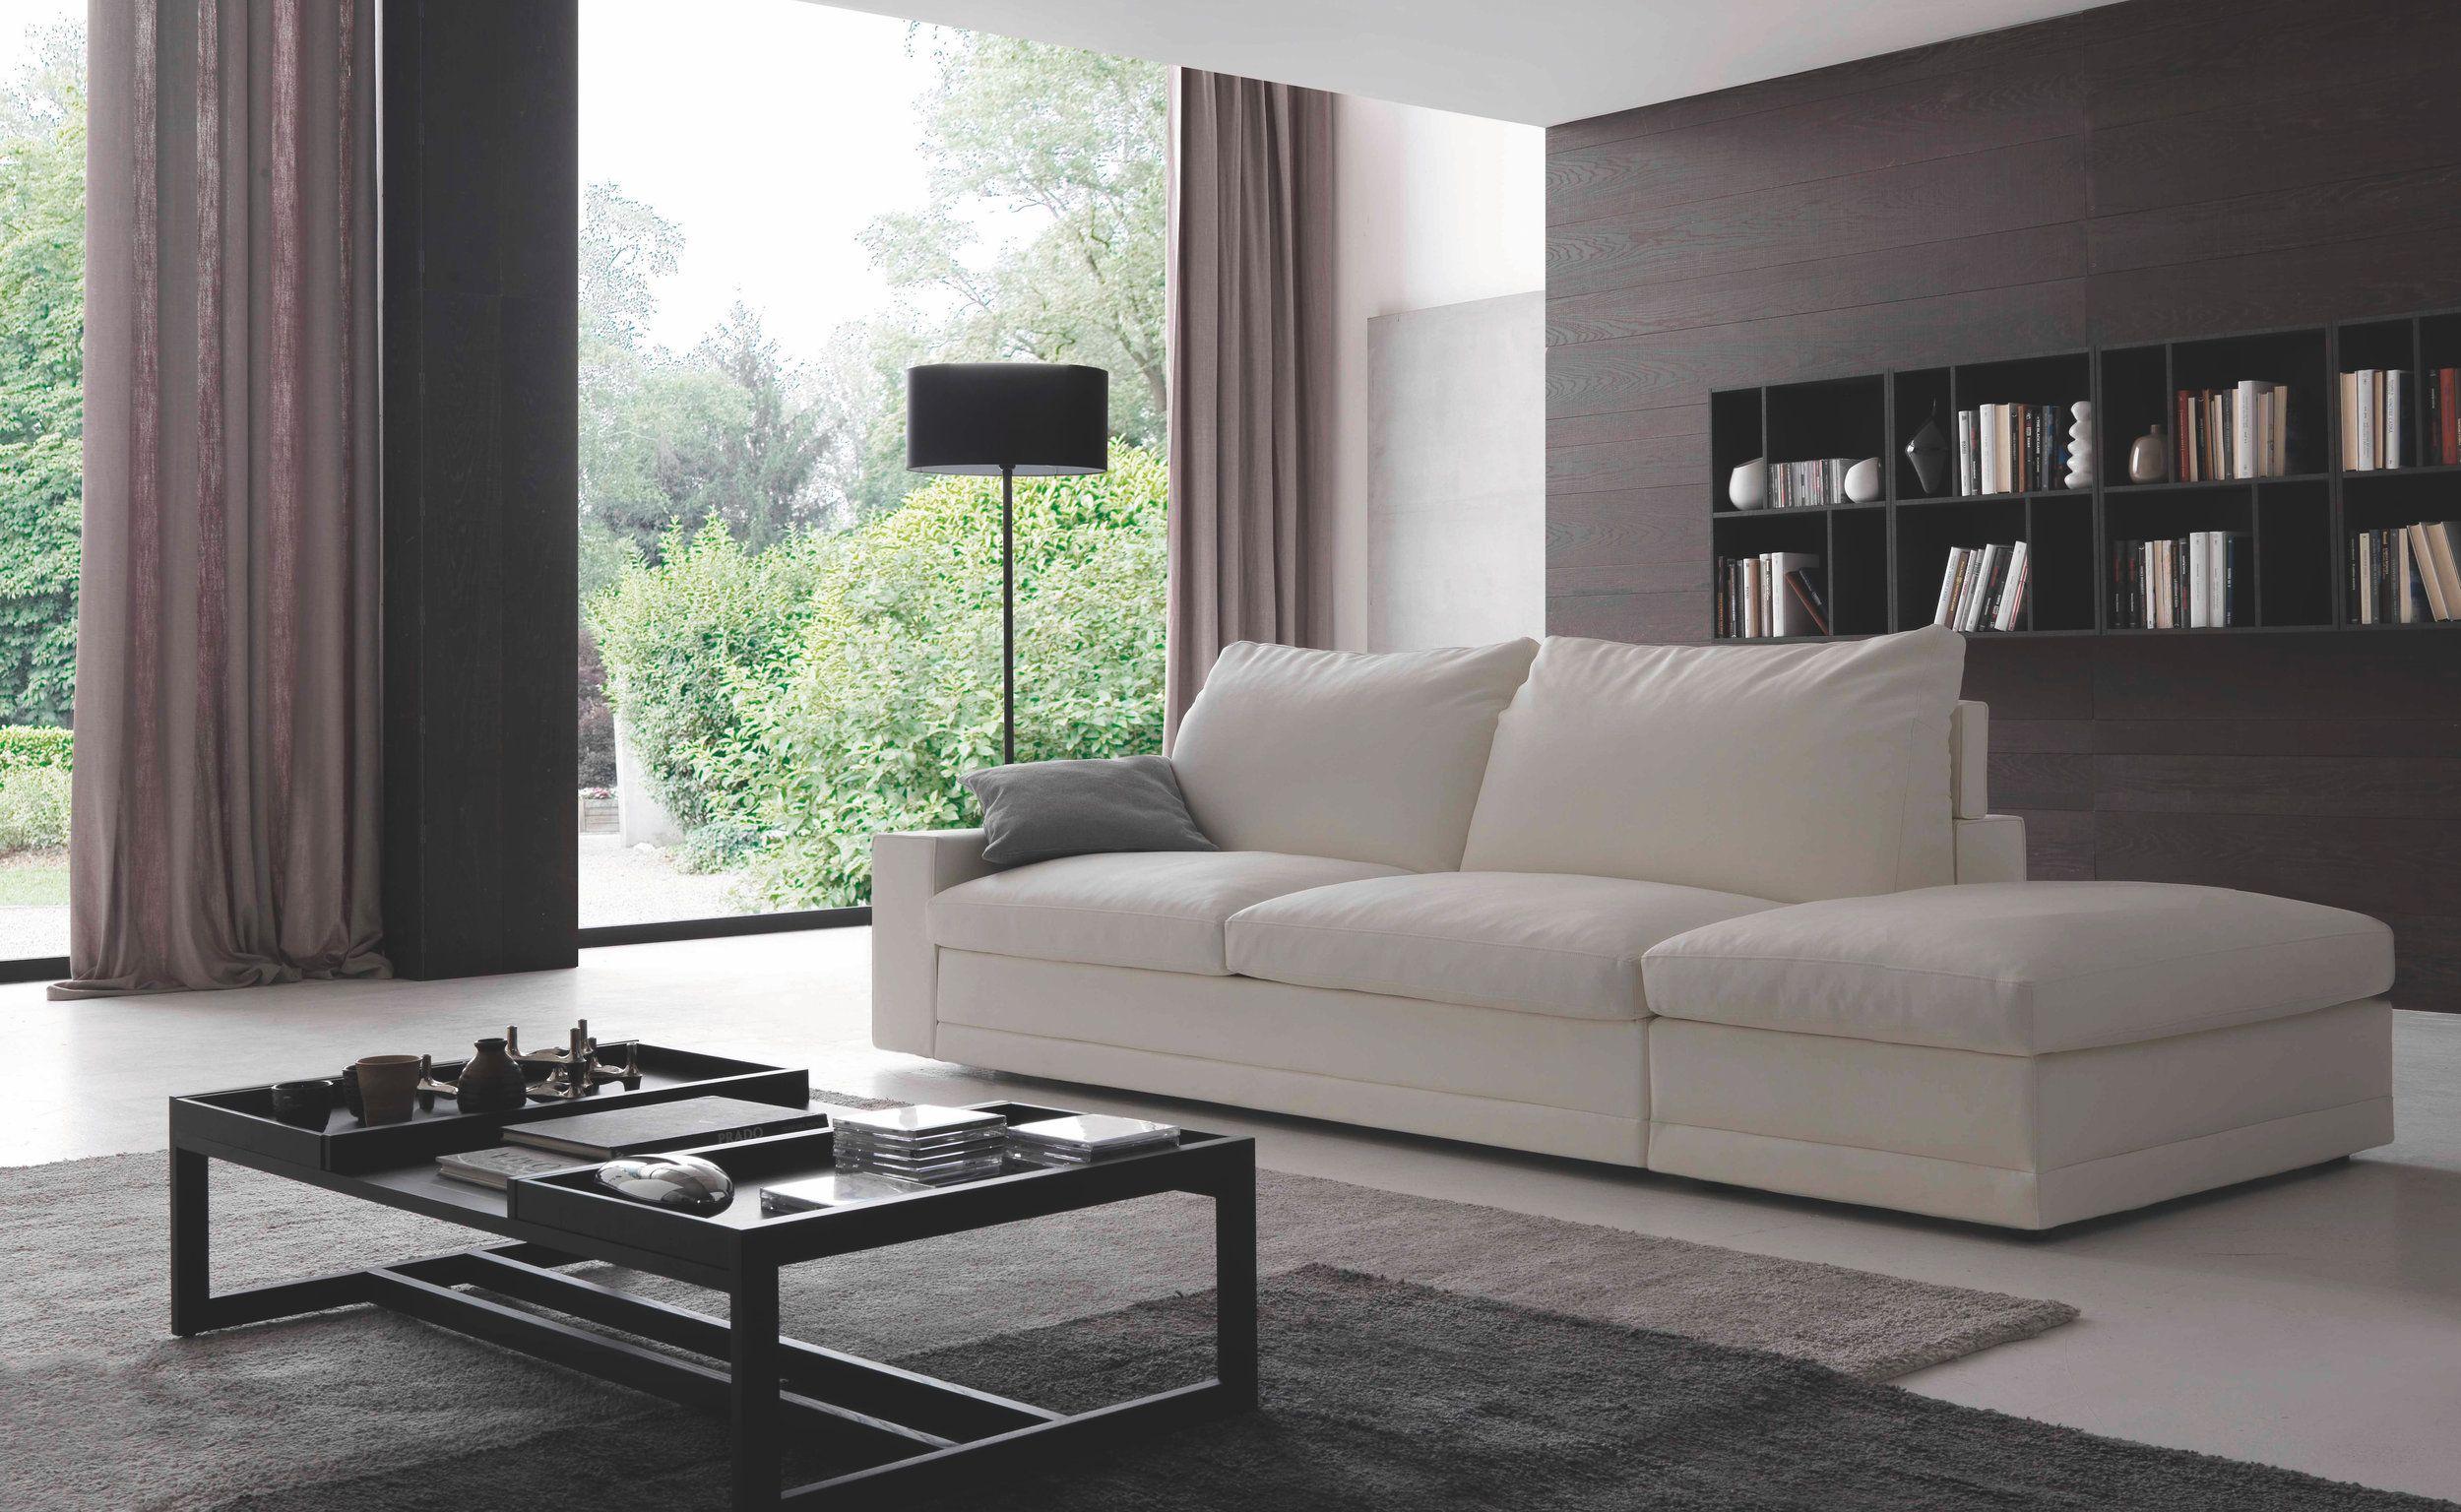 Swell Pin By Designitalia On Modern Sofa Beds Sectional Sofas Uwap Interior Chair Design Uwaporg